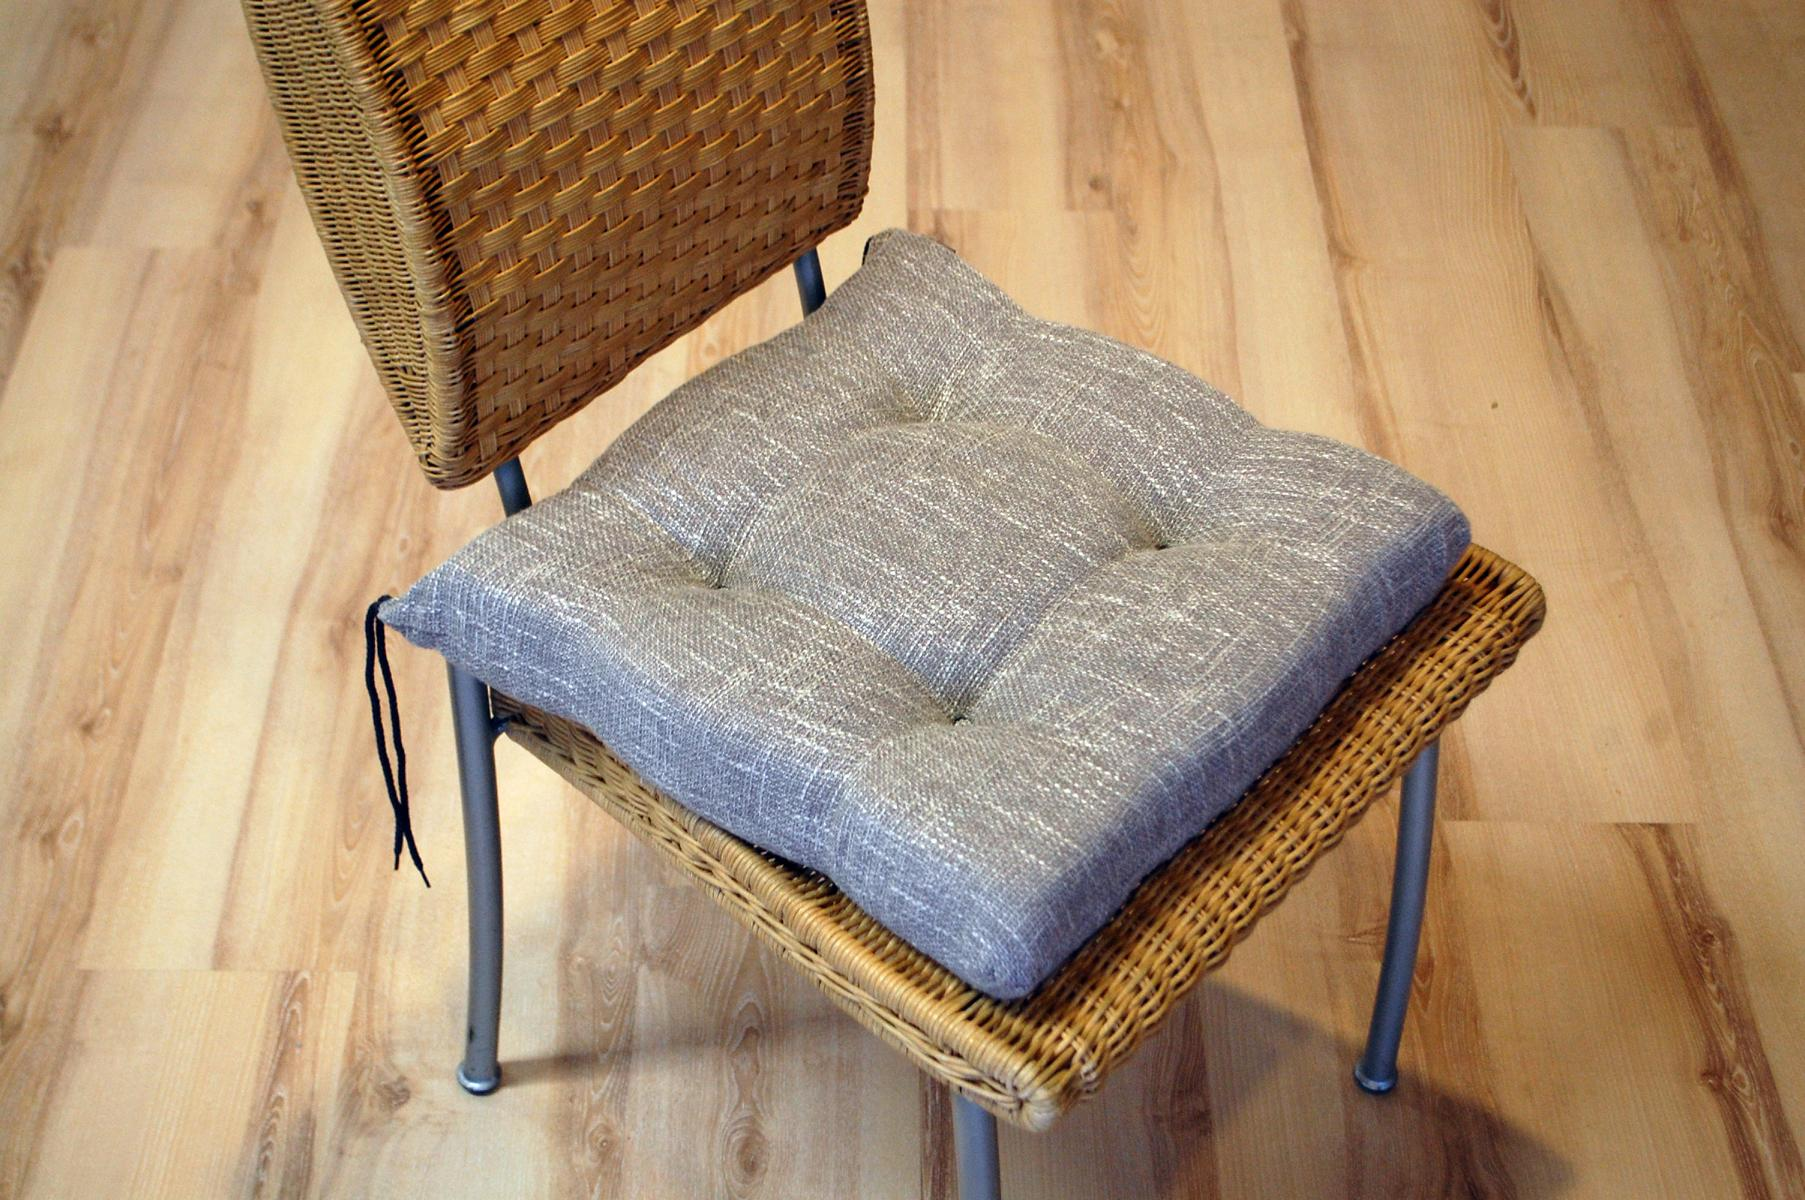 stuhlkissen sitzkissen sun garden henry 720 silber grau 50365 5900246374307 ebay. Black Bedroom Furniture Sets. Home Design Ideas